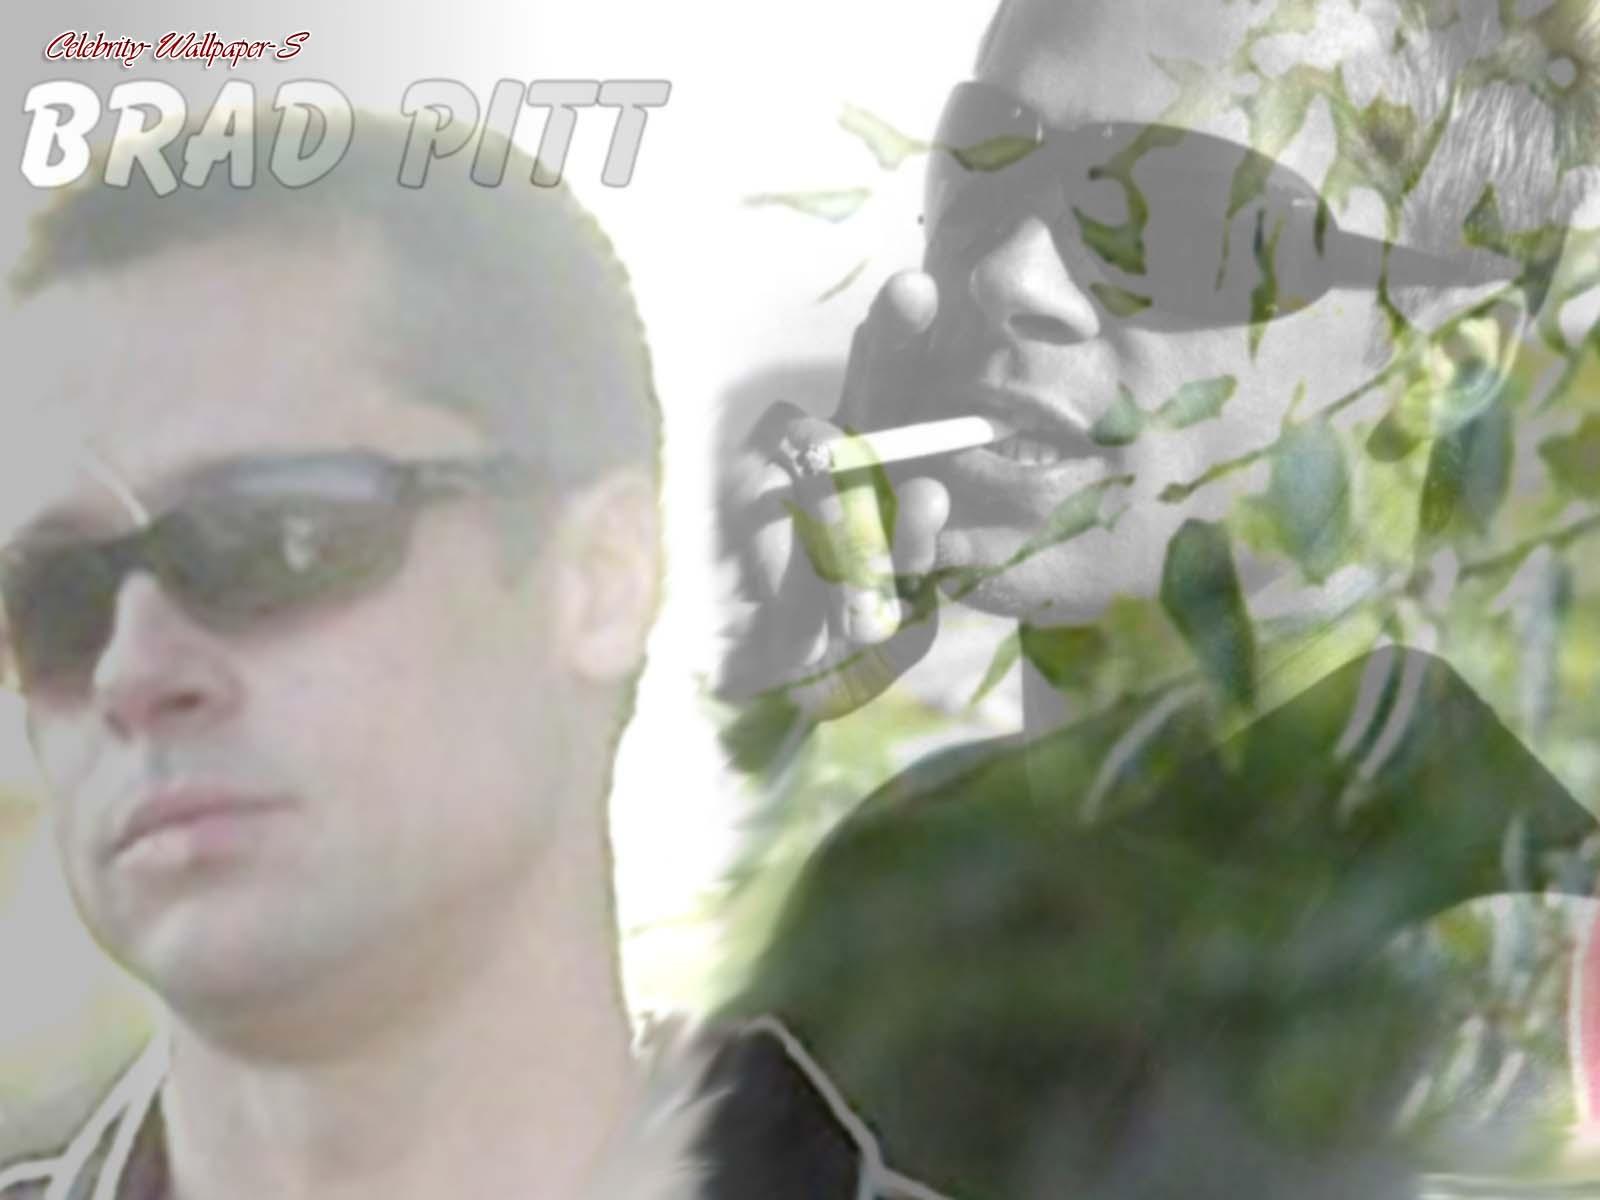 http://2.bp.blogspot.com/_zHx02JB4GE0/TSNy-1oB_4I/AAAAAAAAAcI/DEoaIhPbqQY/s1600/Brad+Pitt+wallpaper+%25287%2529.jpg